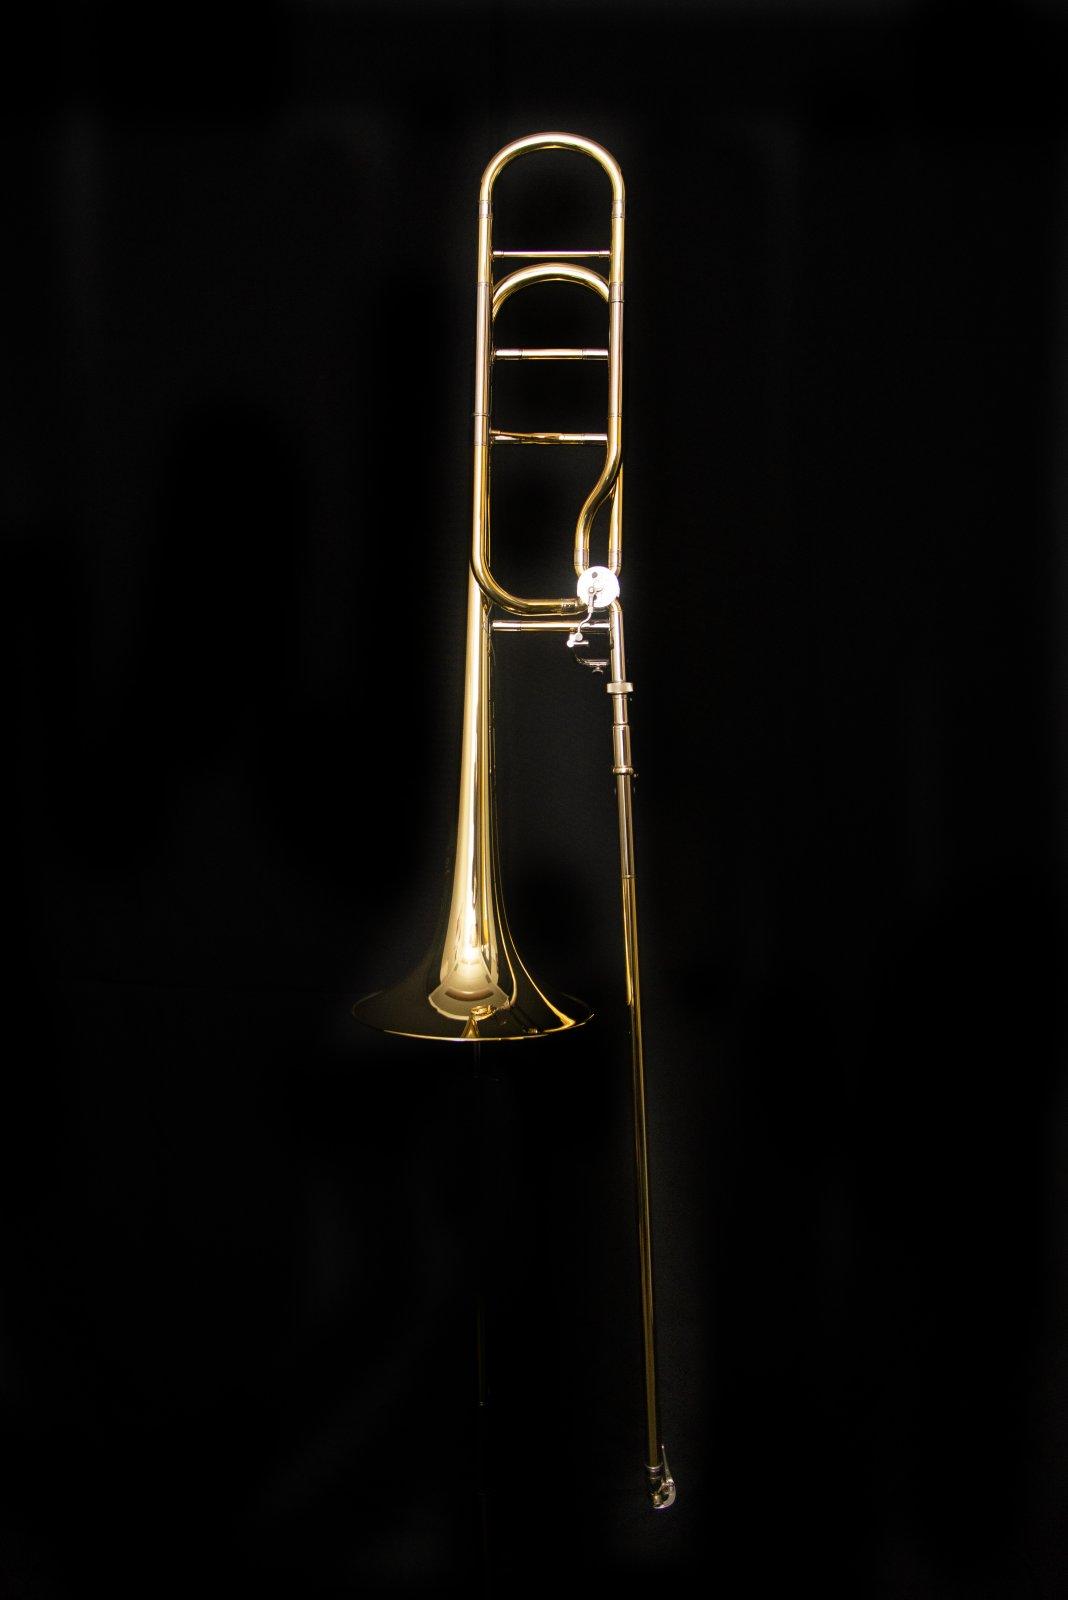 Yamaha YSL-882OR Xeno Tenor Trombone